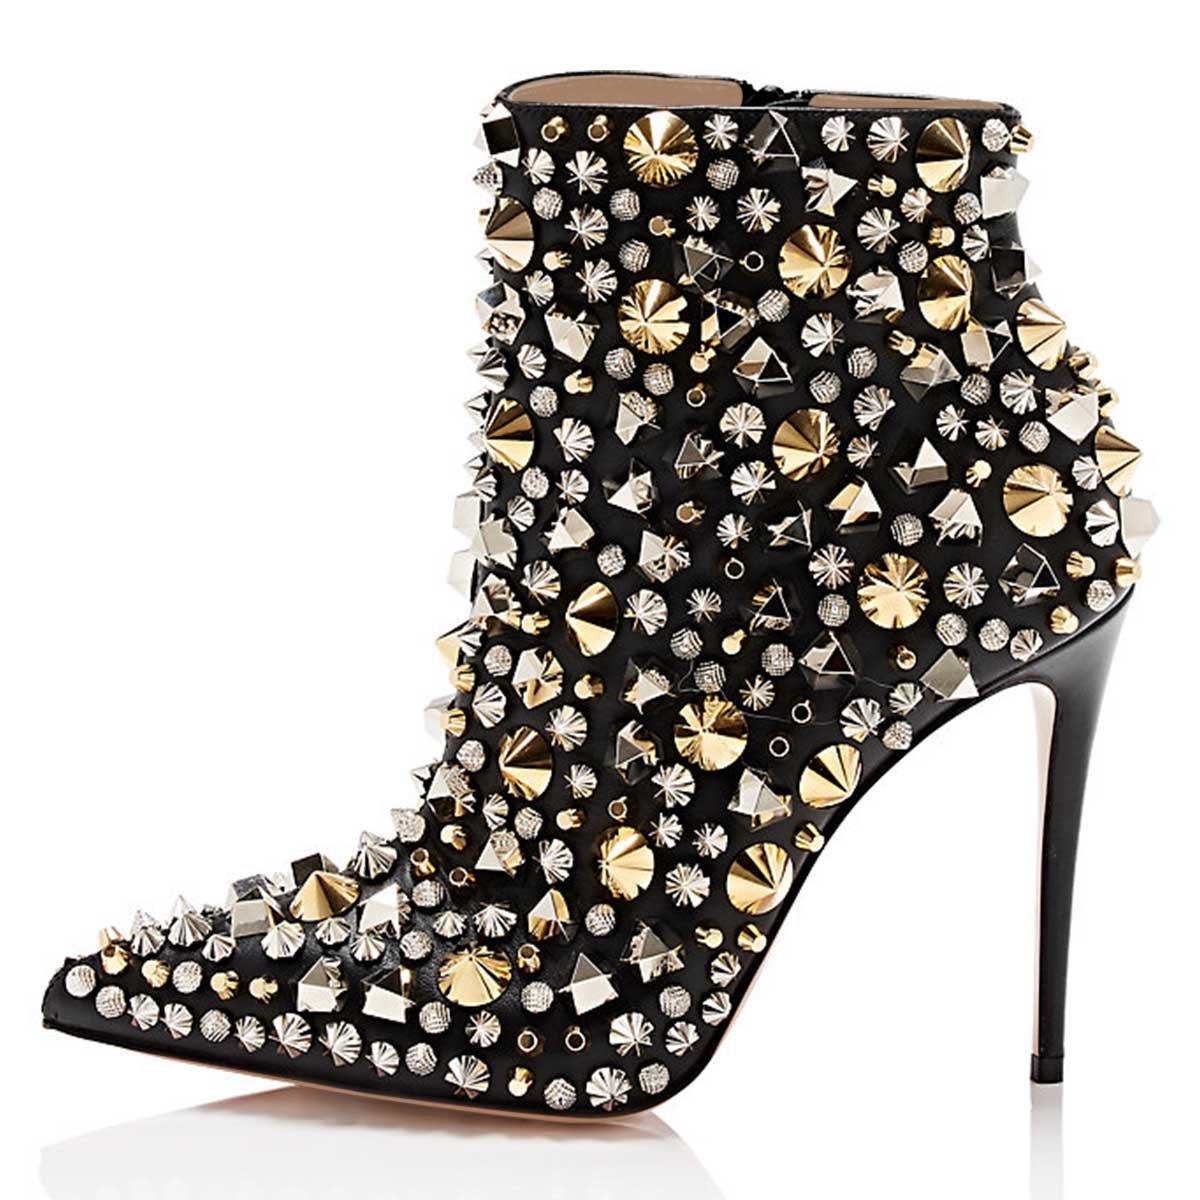 429d4d4e87a ... FSJ Women Fashion High Heel Ankle Boots Boots Boots with Rivets Pointed  Toe Stilettos Zipper Shoes ...